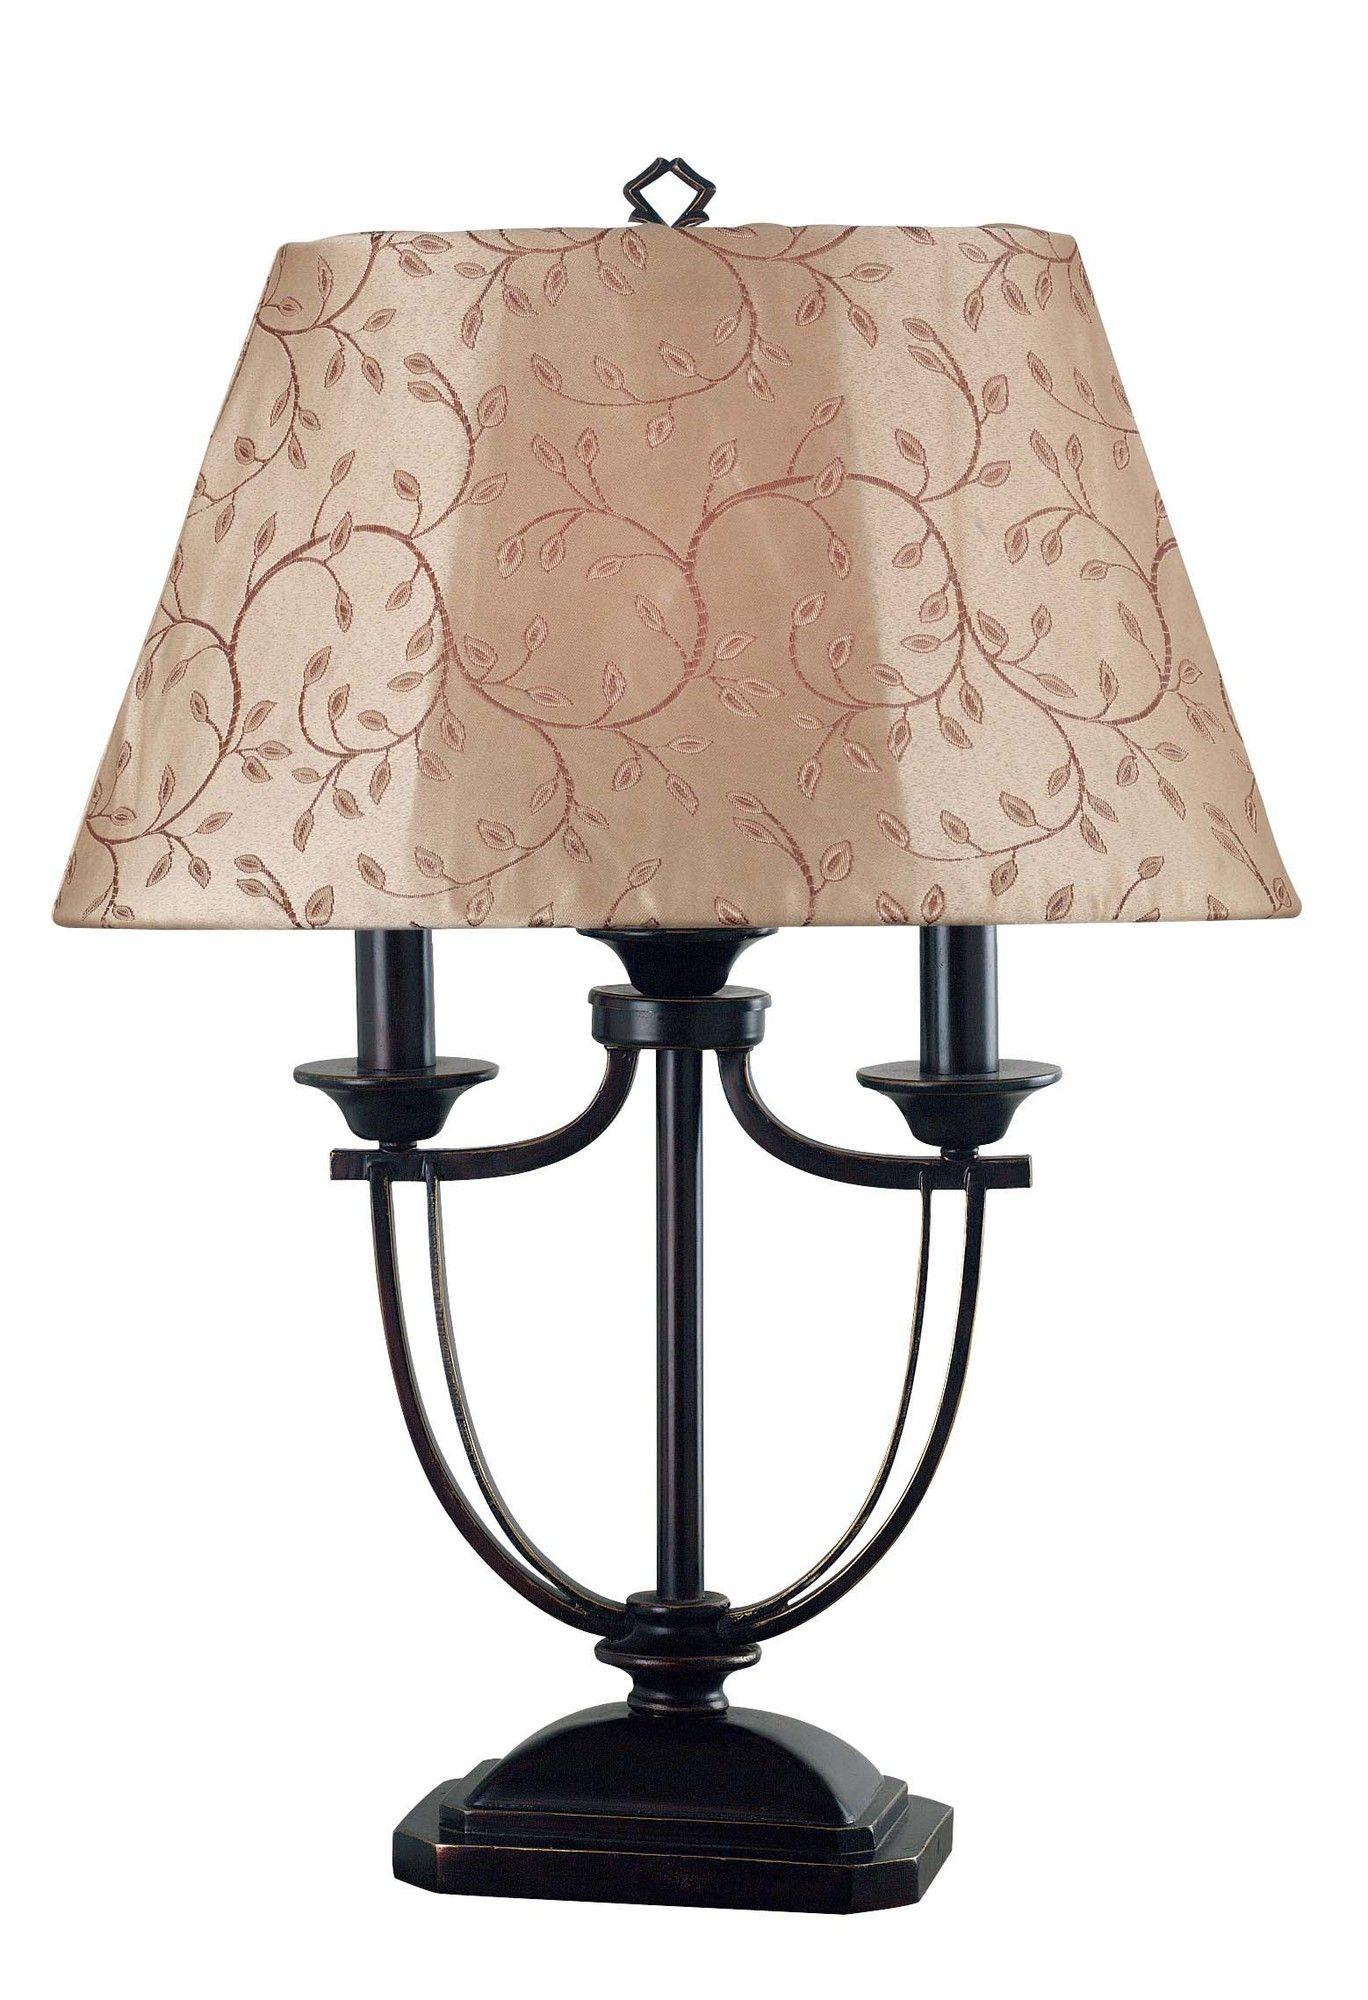 Outdoor lamps  Tabitha IndoorOutdoor Table Lamp  Products  Pinterest  Outdoor